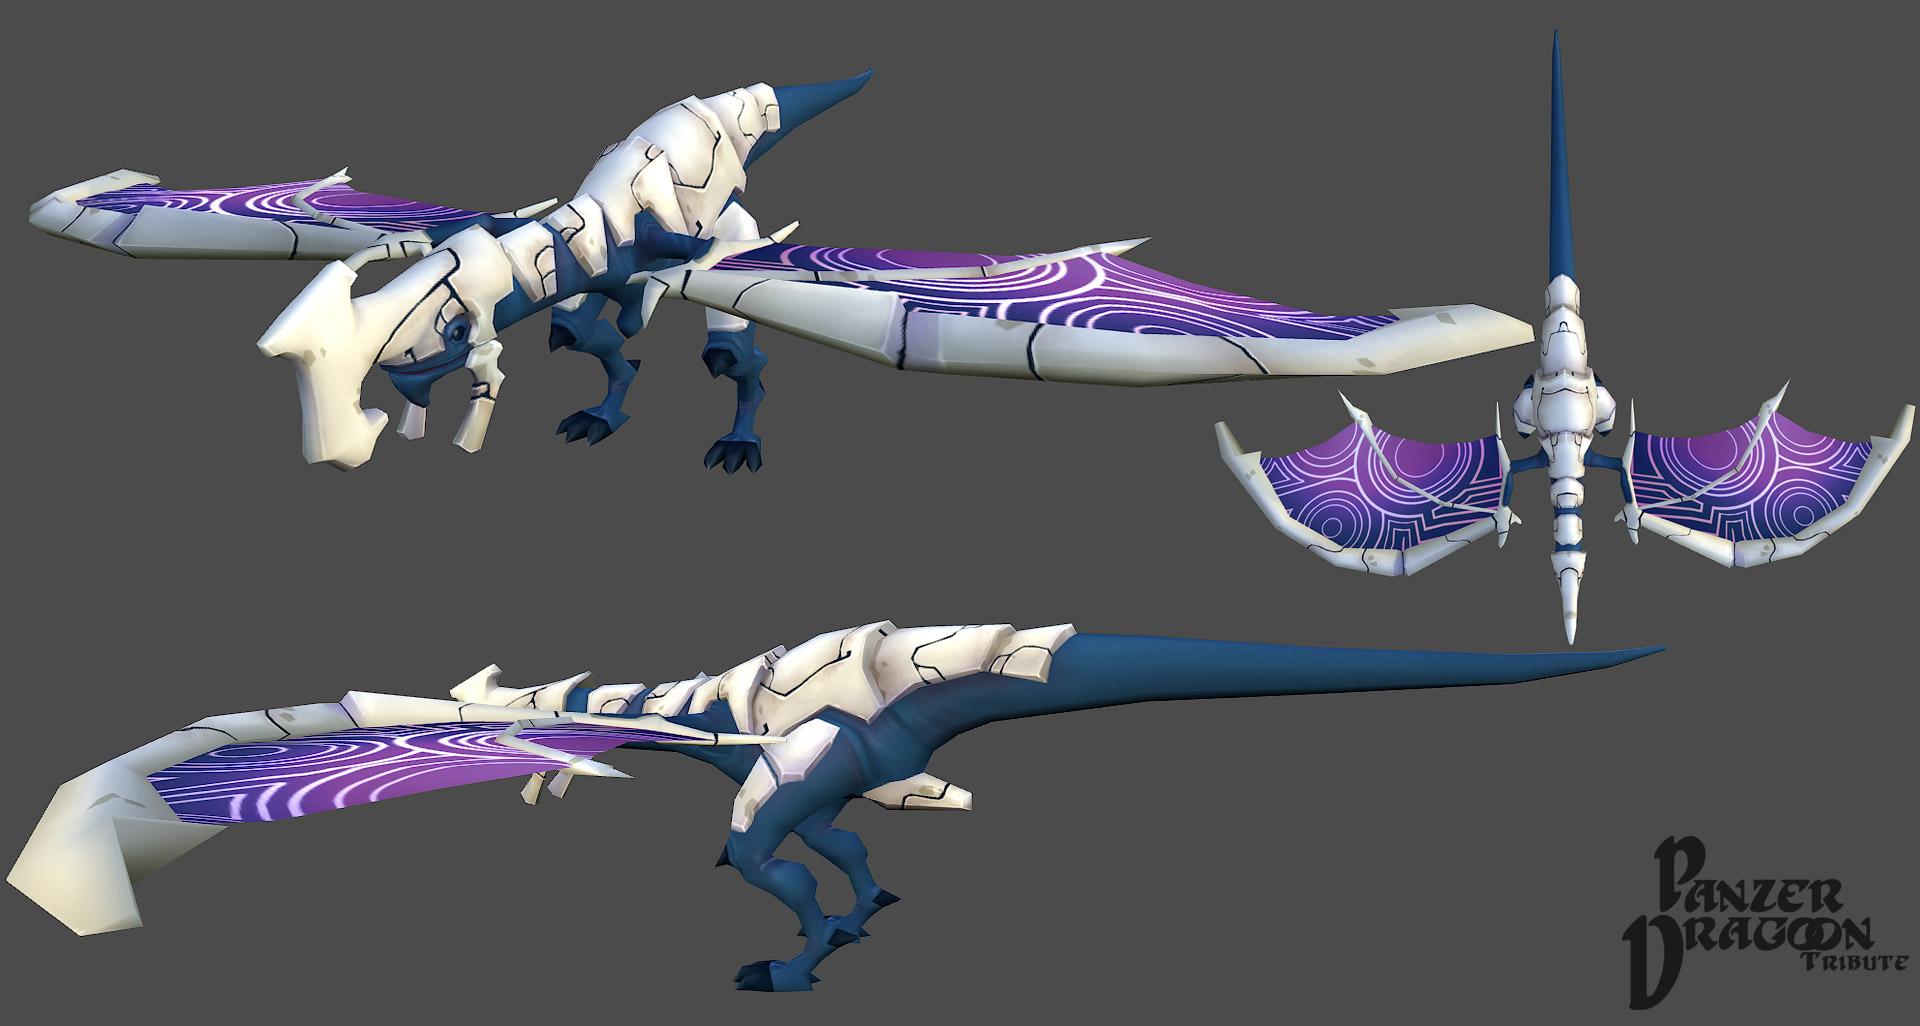 3D_Dragon_002.jpg